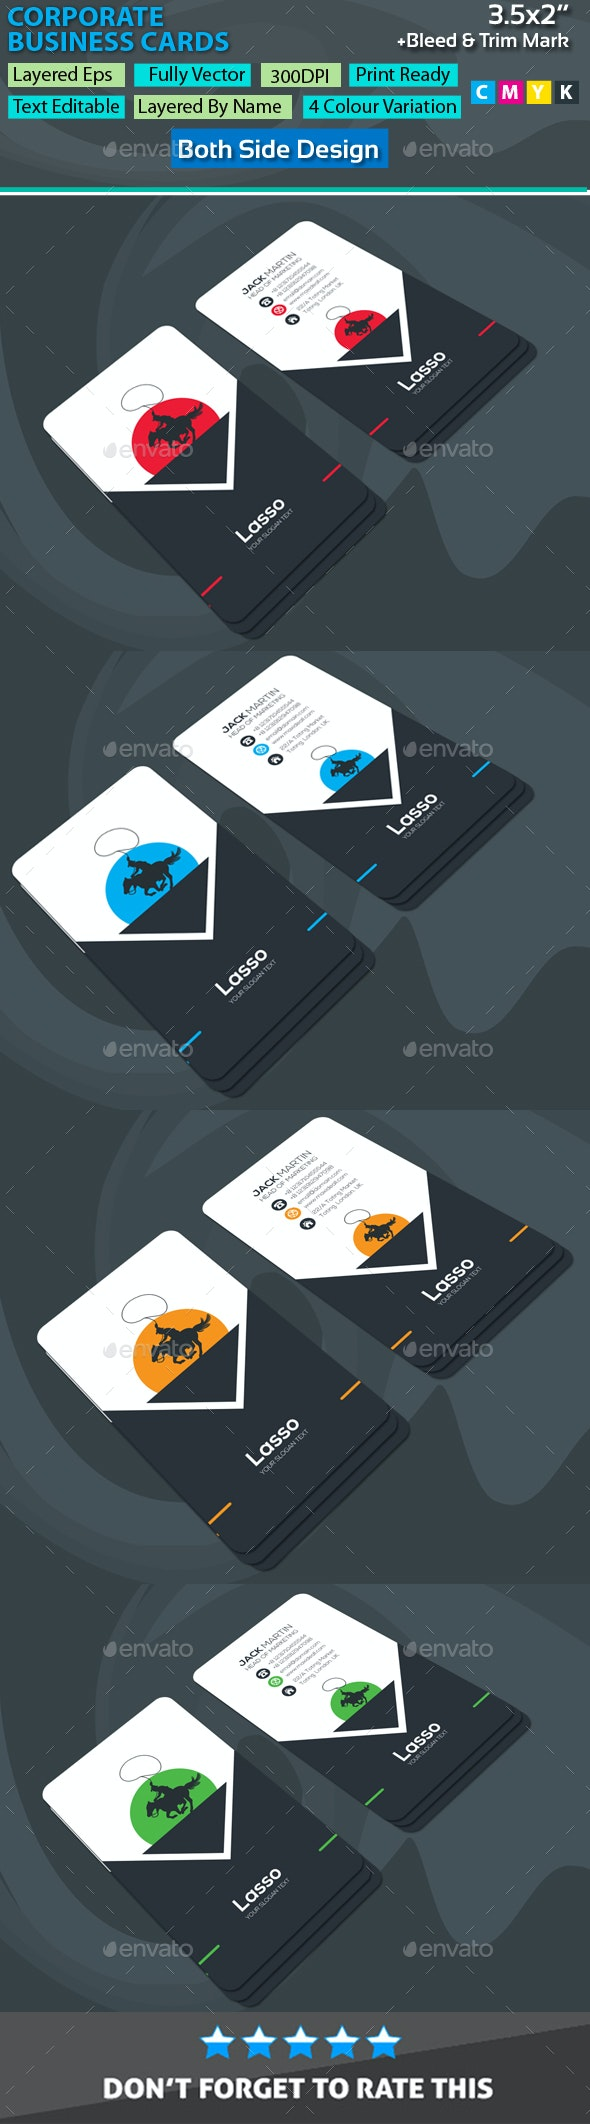 Lasso Corporate Business Cards - Corporate Business Cards